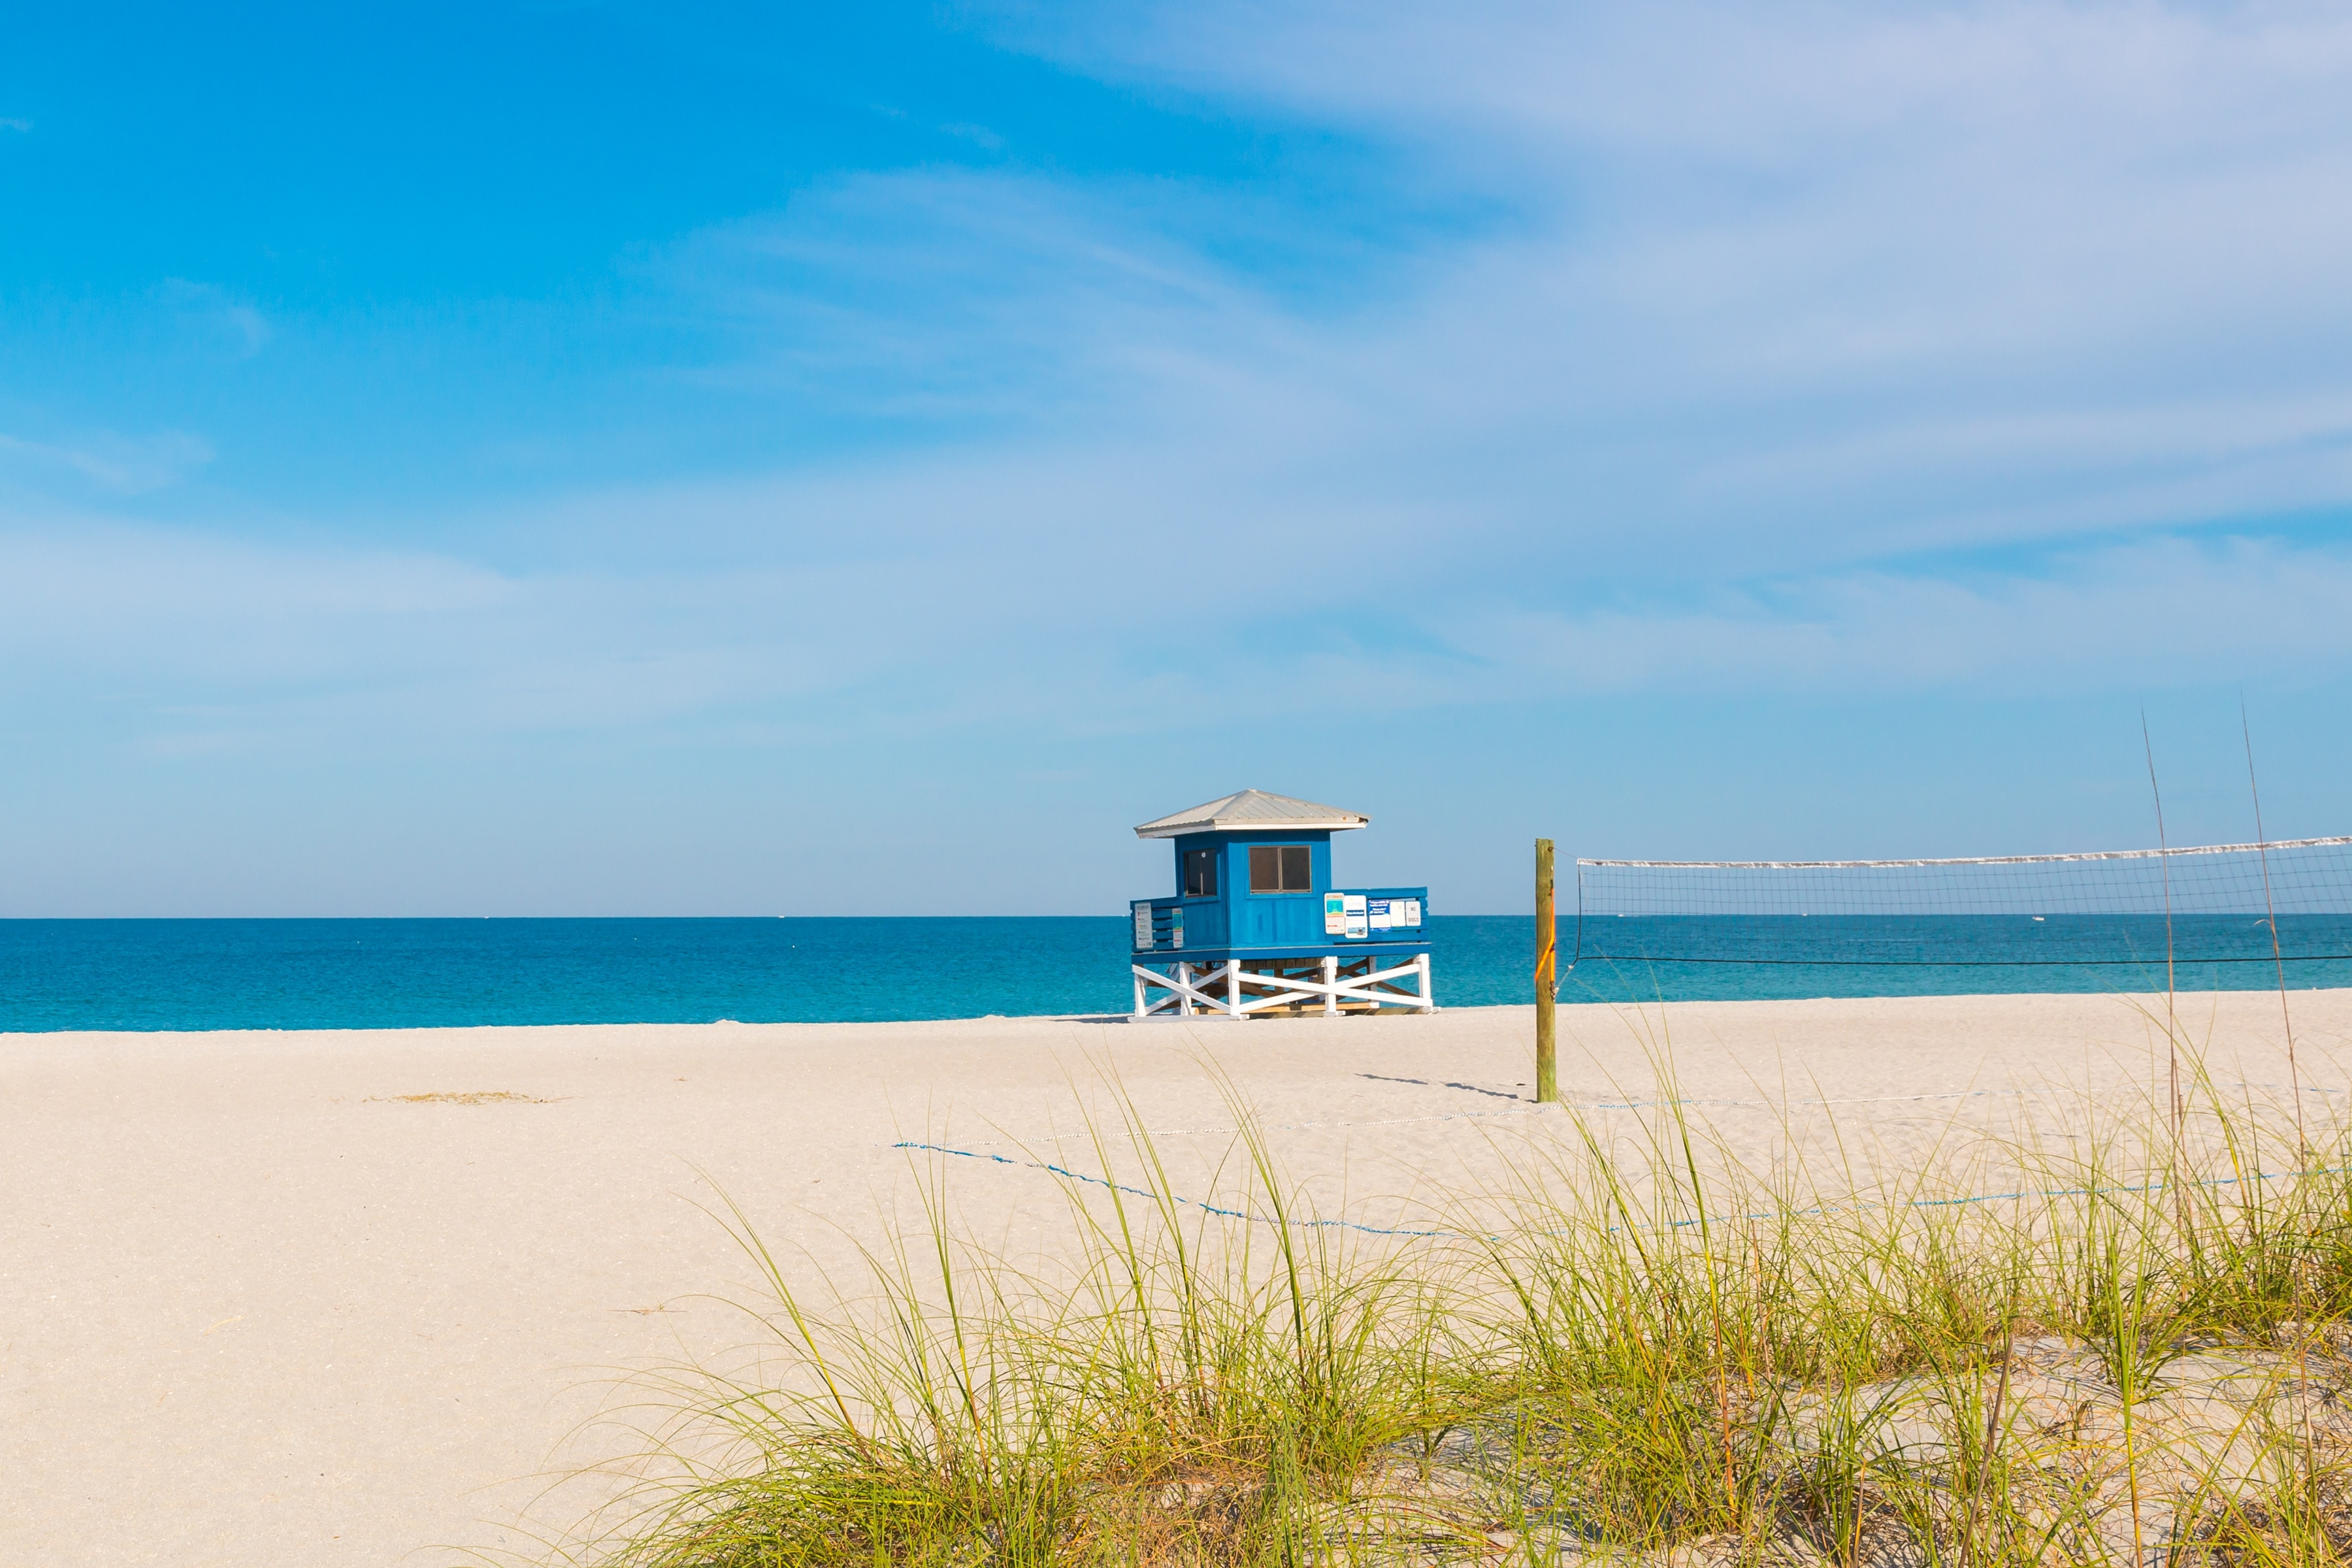 Golden Beach, Venice, Florida, United States of America